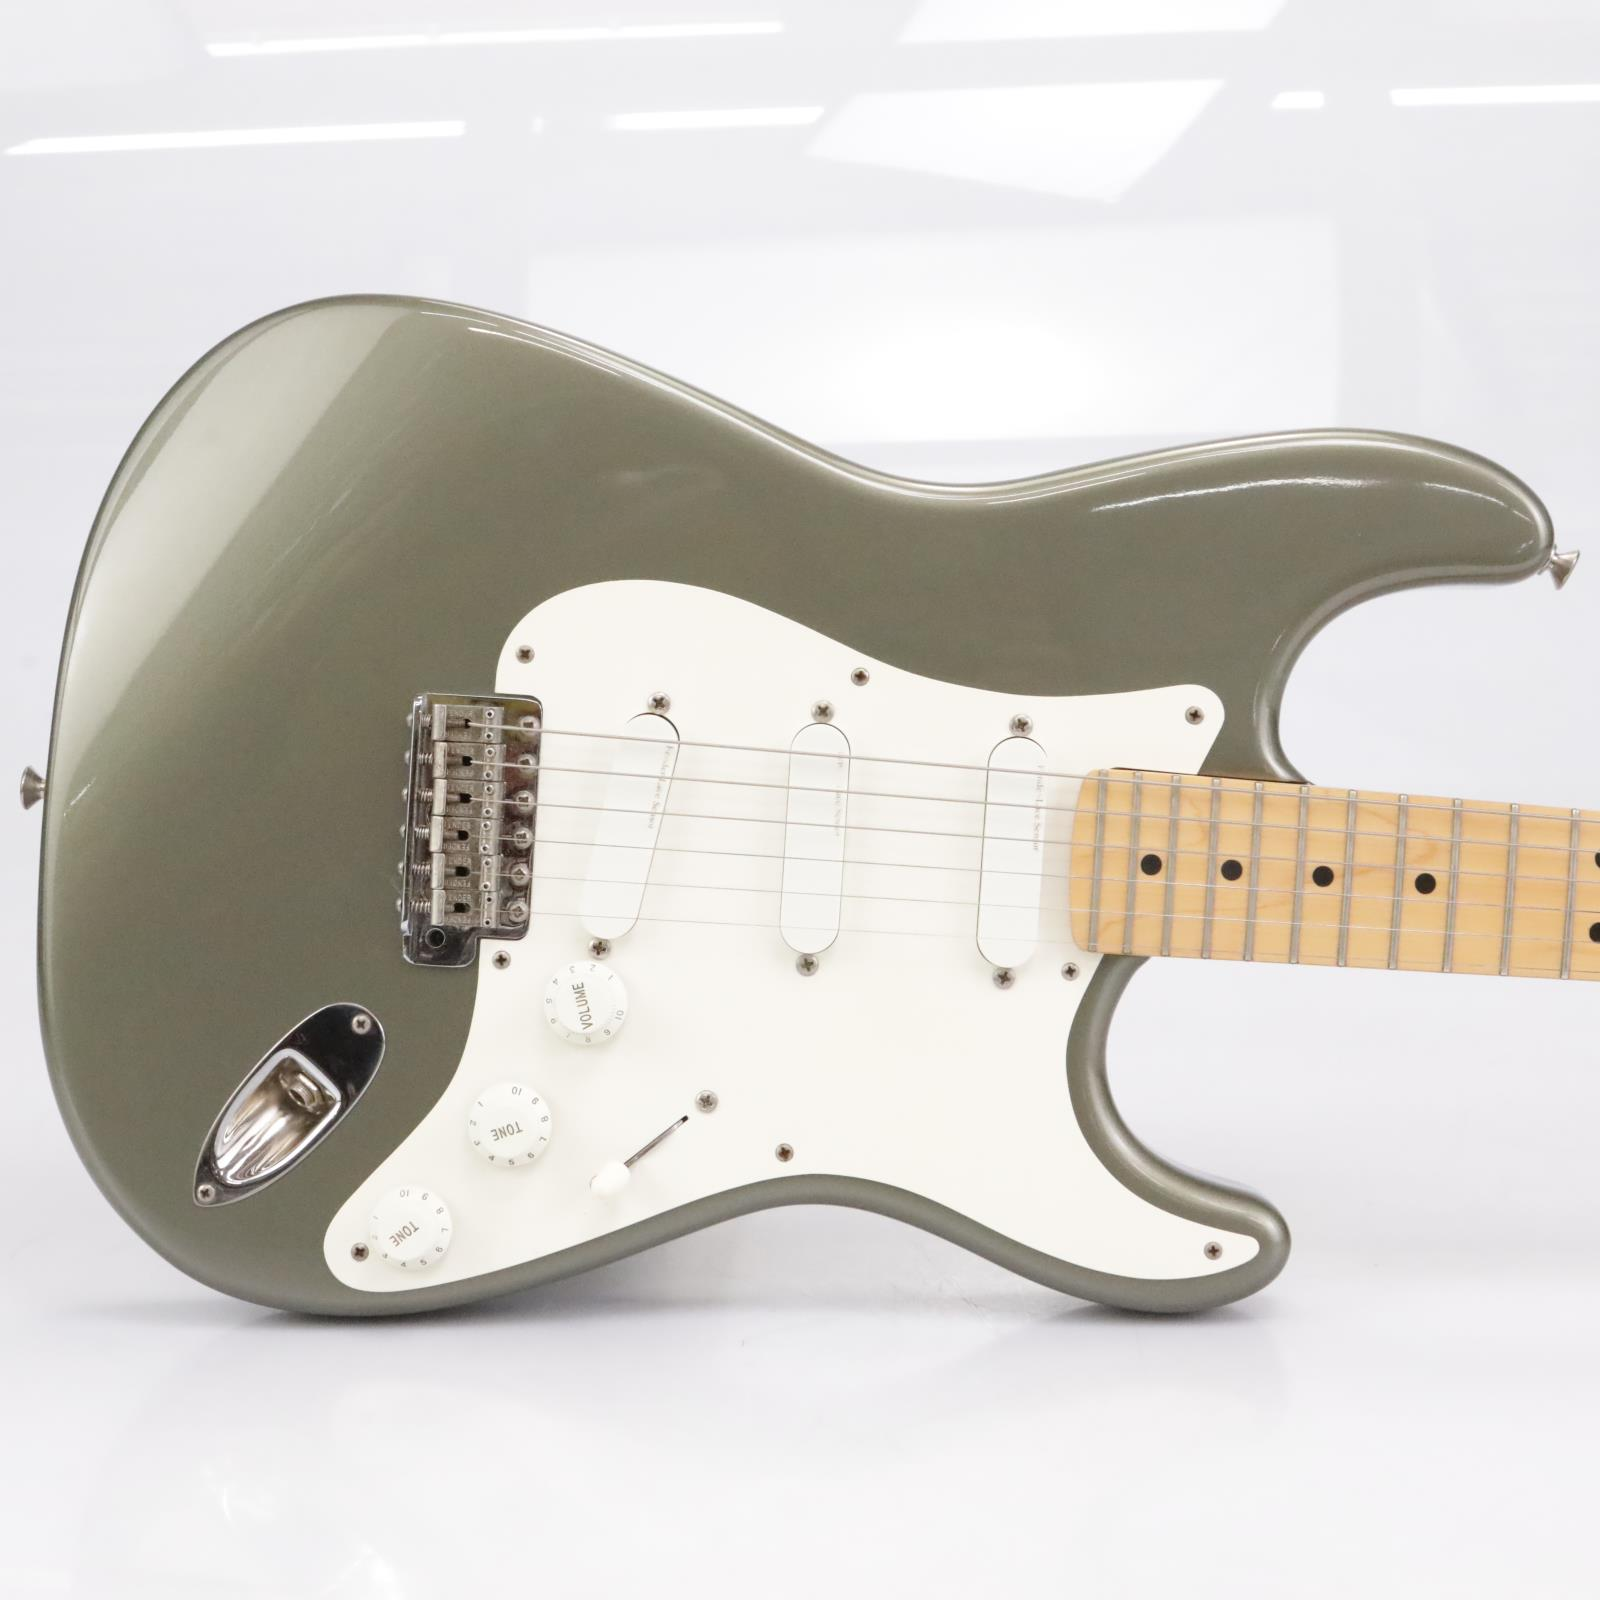 1993 Fender Eric Clapton Signature Series Stratocaster Pewter w/Case #43472